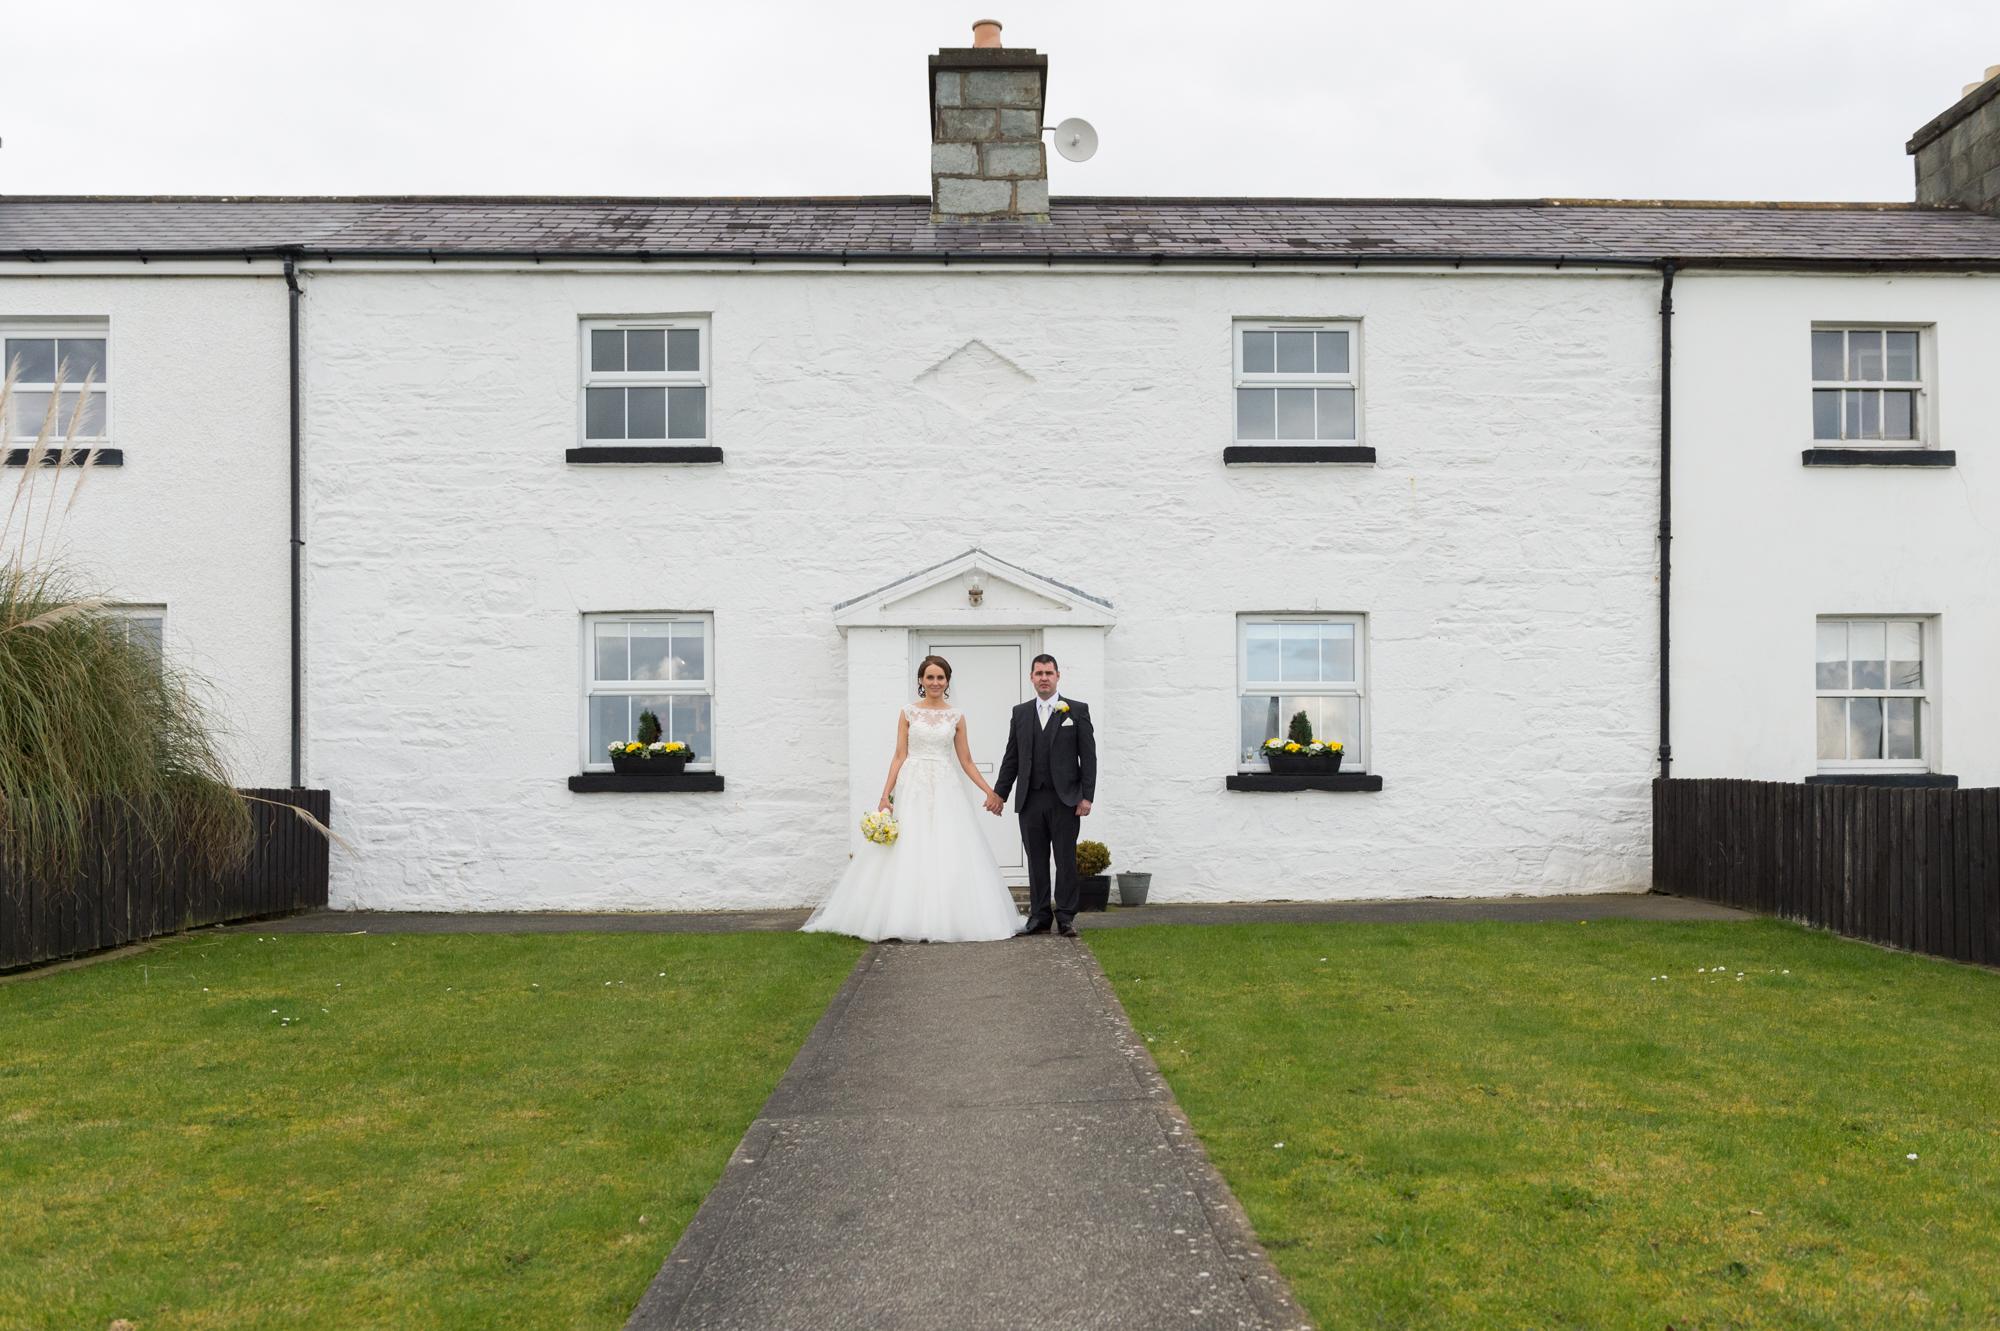 Michael_Gill_Photography_Wedding_Greencastle_Lousie_Jason_Donegal-11.jpg